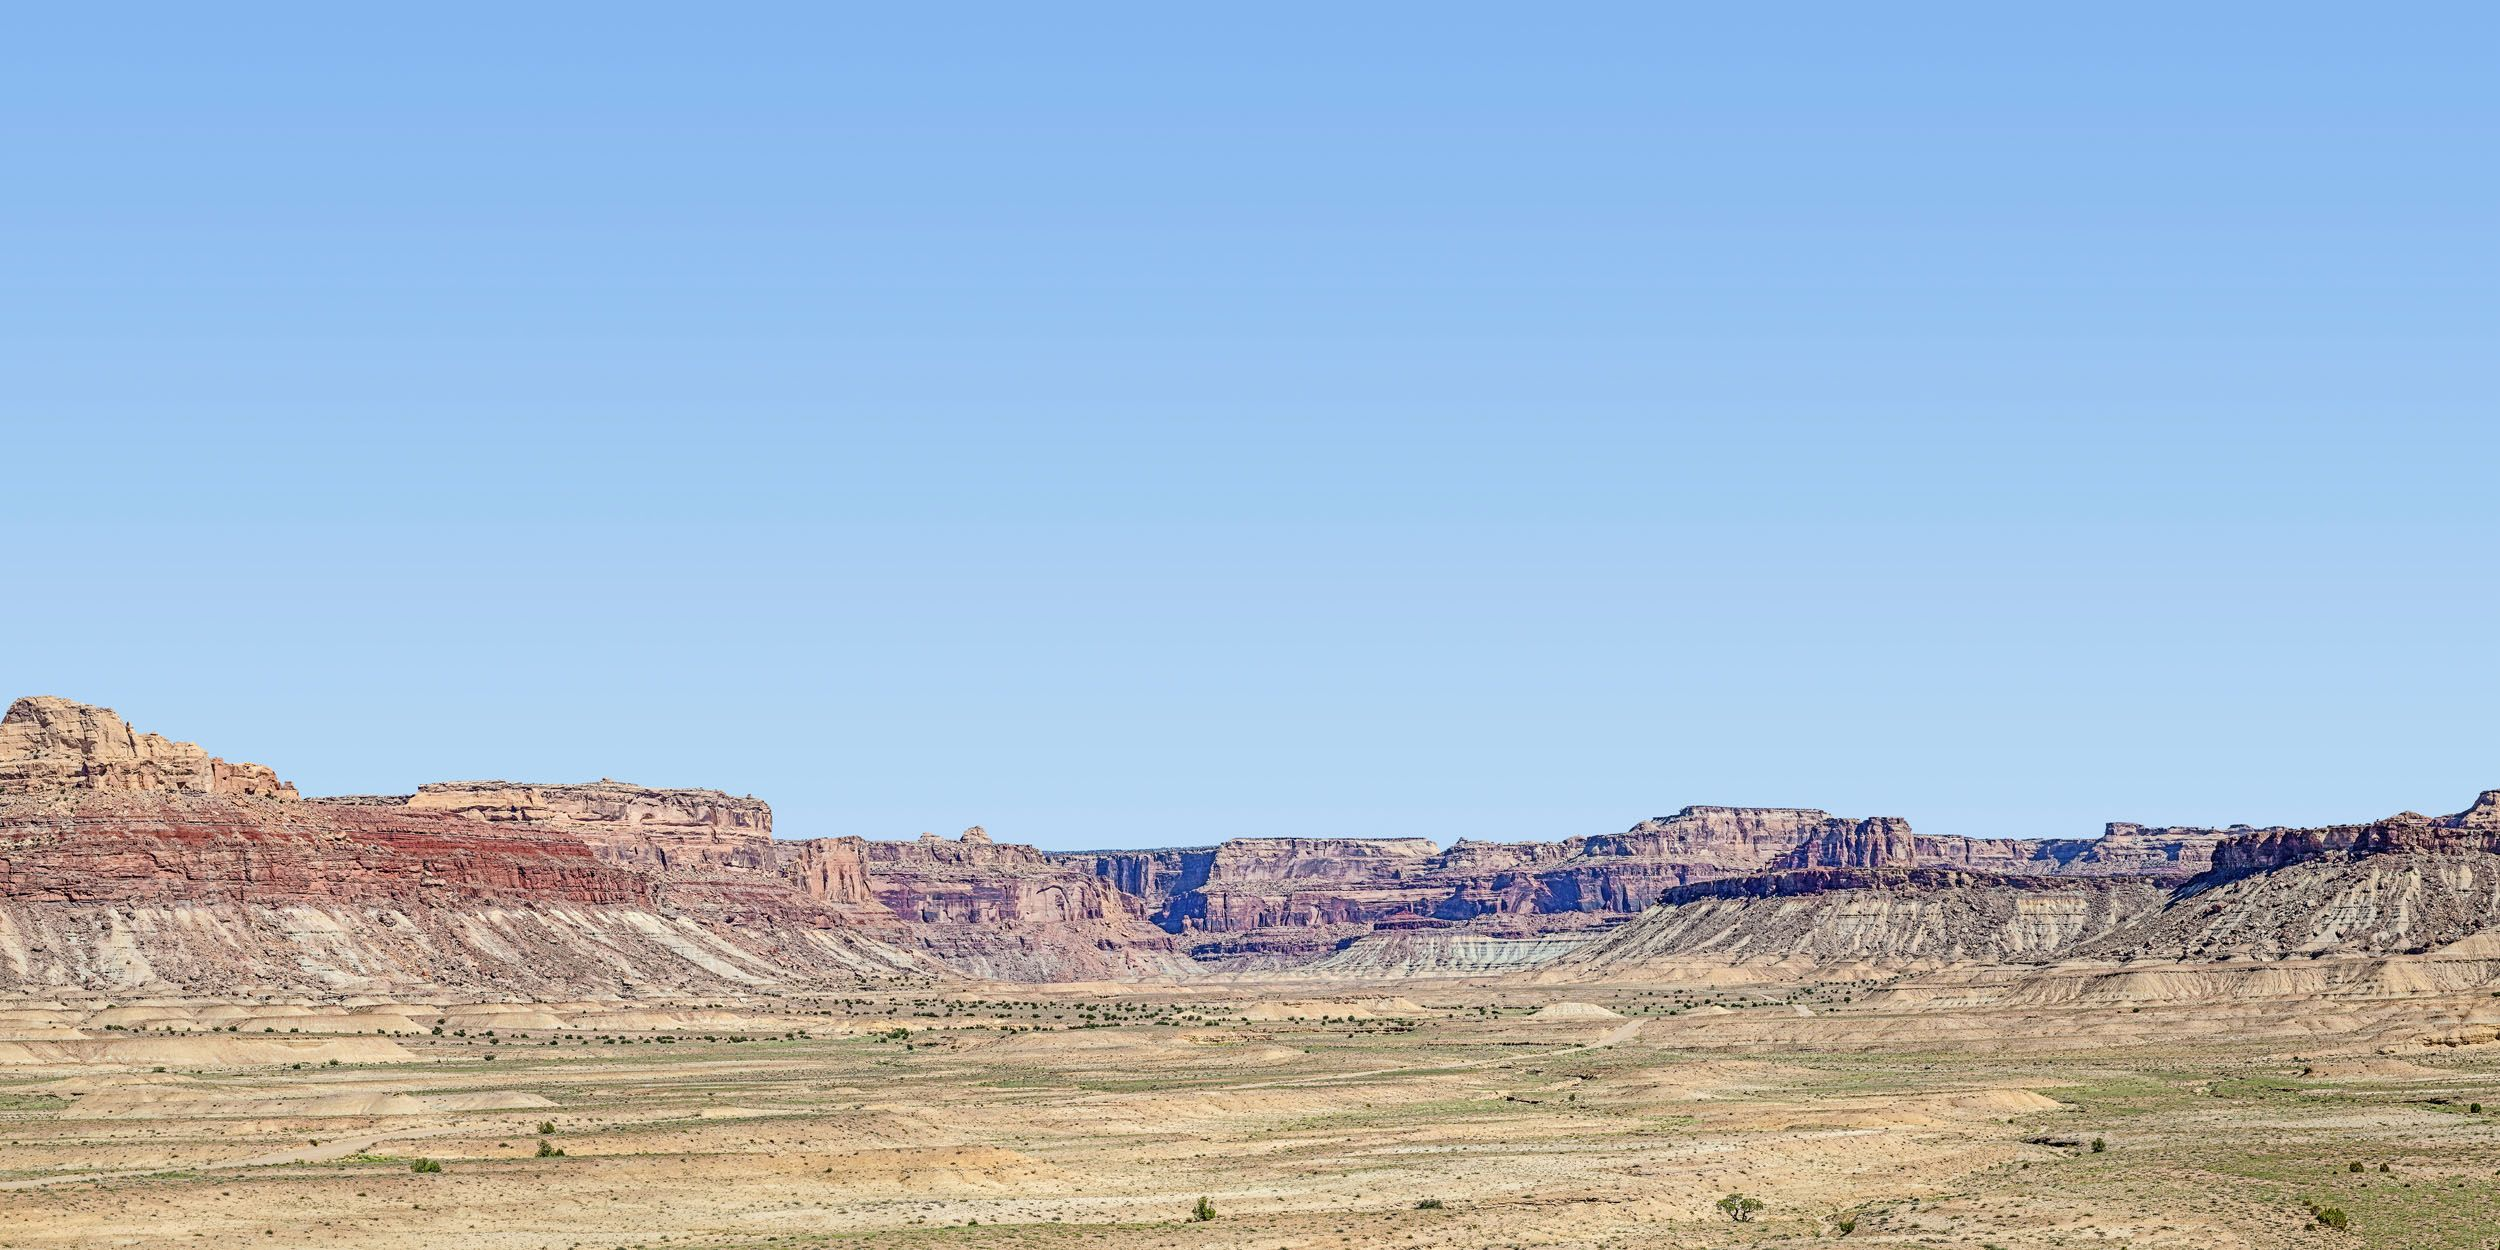 069MG_3976_from_panorama_2x1_v1_Limestone_Bench.jpg